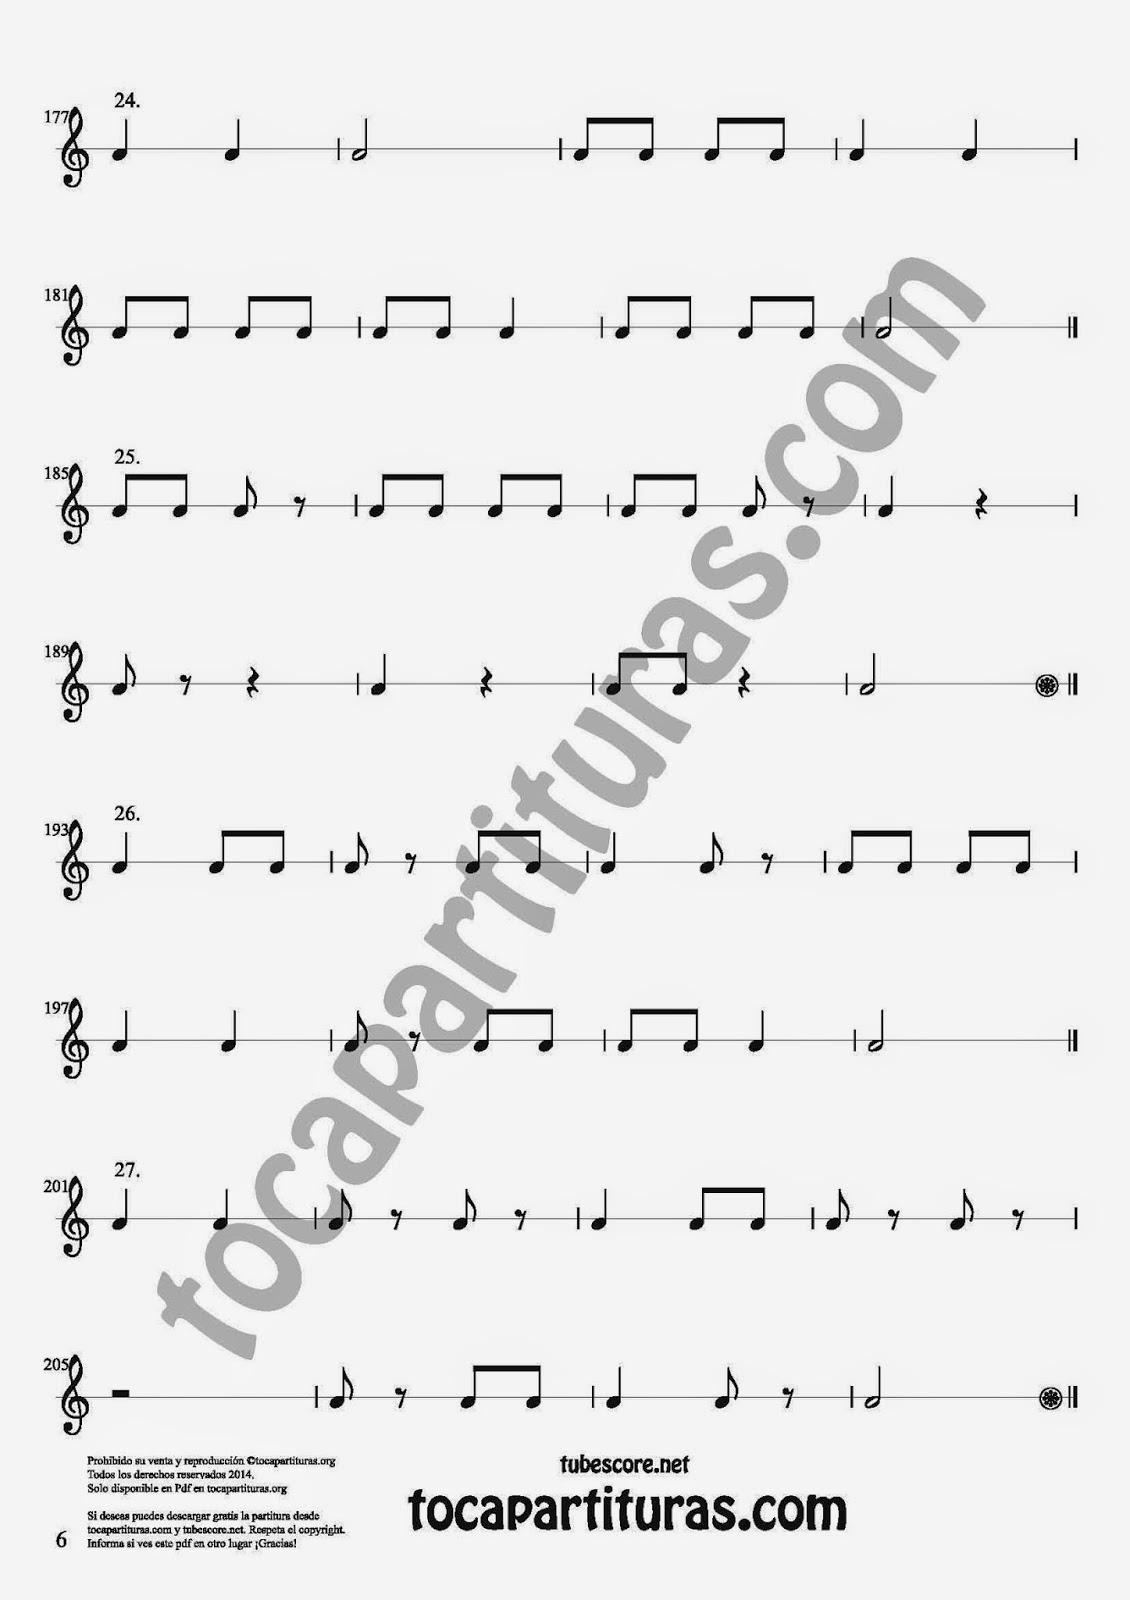 6. 27 Ejercicios Rítmicos para Aprener Solfeo en el Compás de 2/4 Aprender negras, corcheas, blancas y sus silencios. Easy Rithm Sheet Music for quarter notes, half notes, 1/8 notes and silences